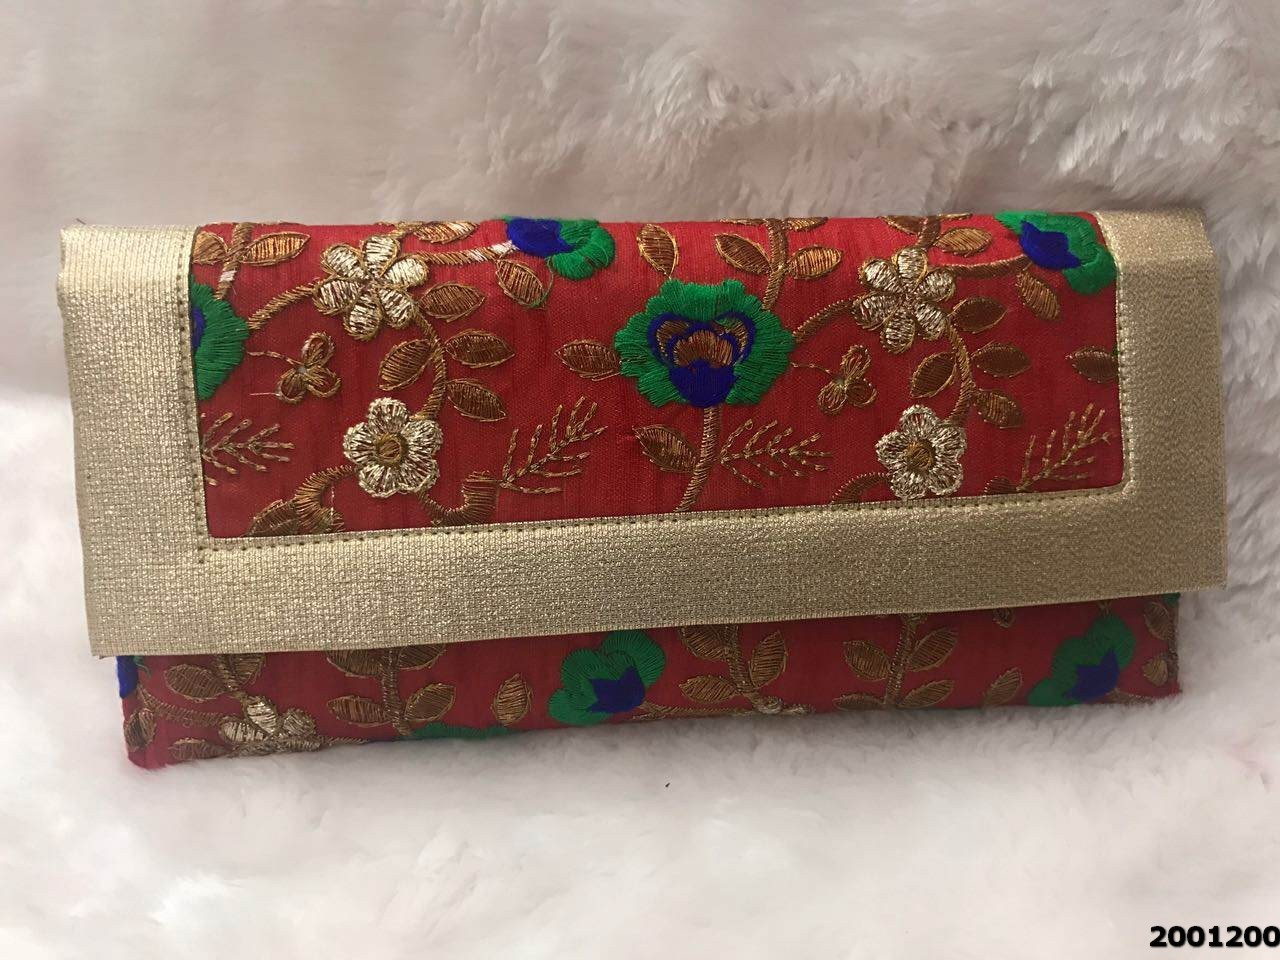 Stunning And Stylish Brocade Evening Clutch Bag